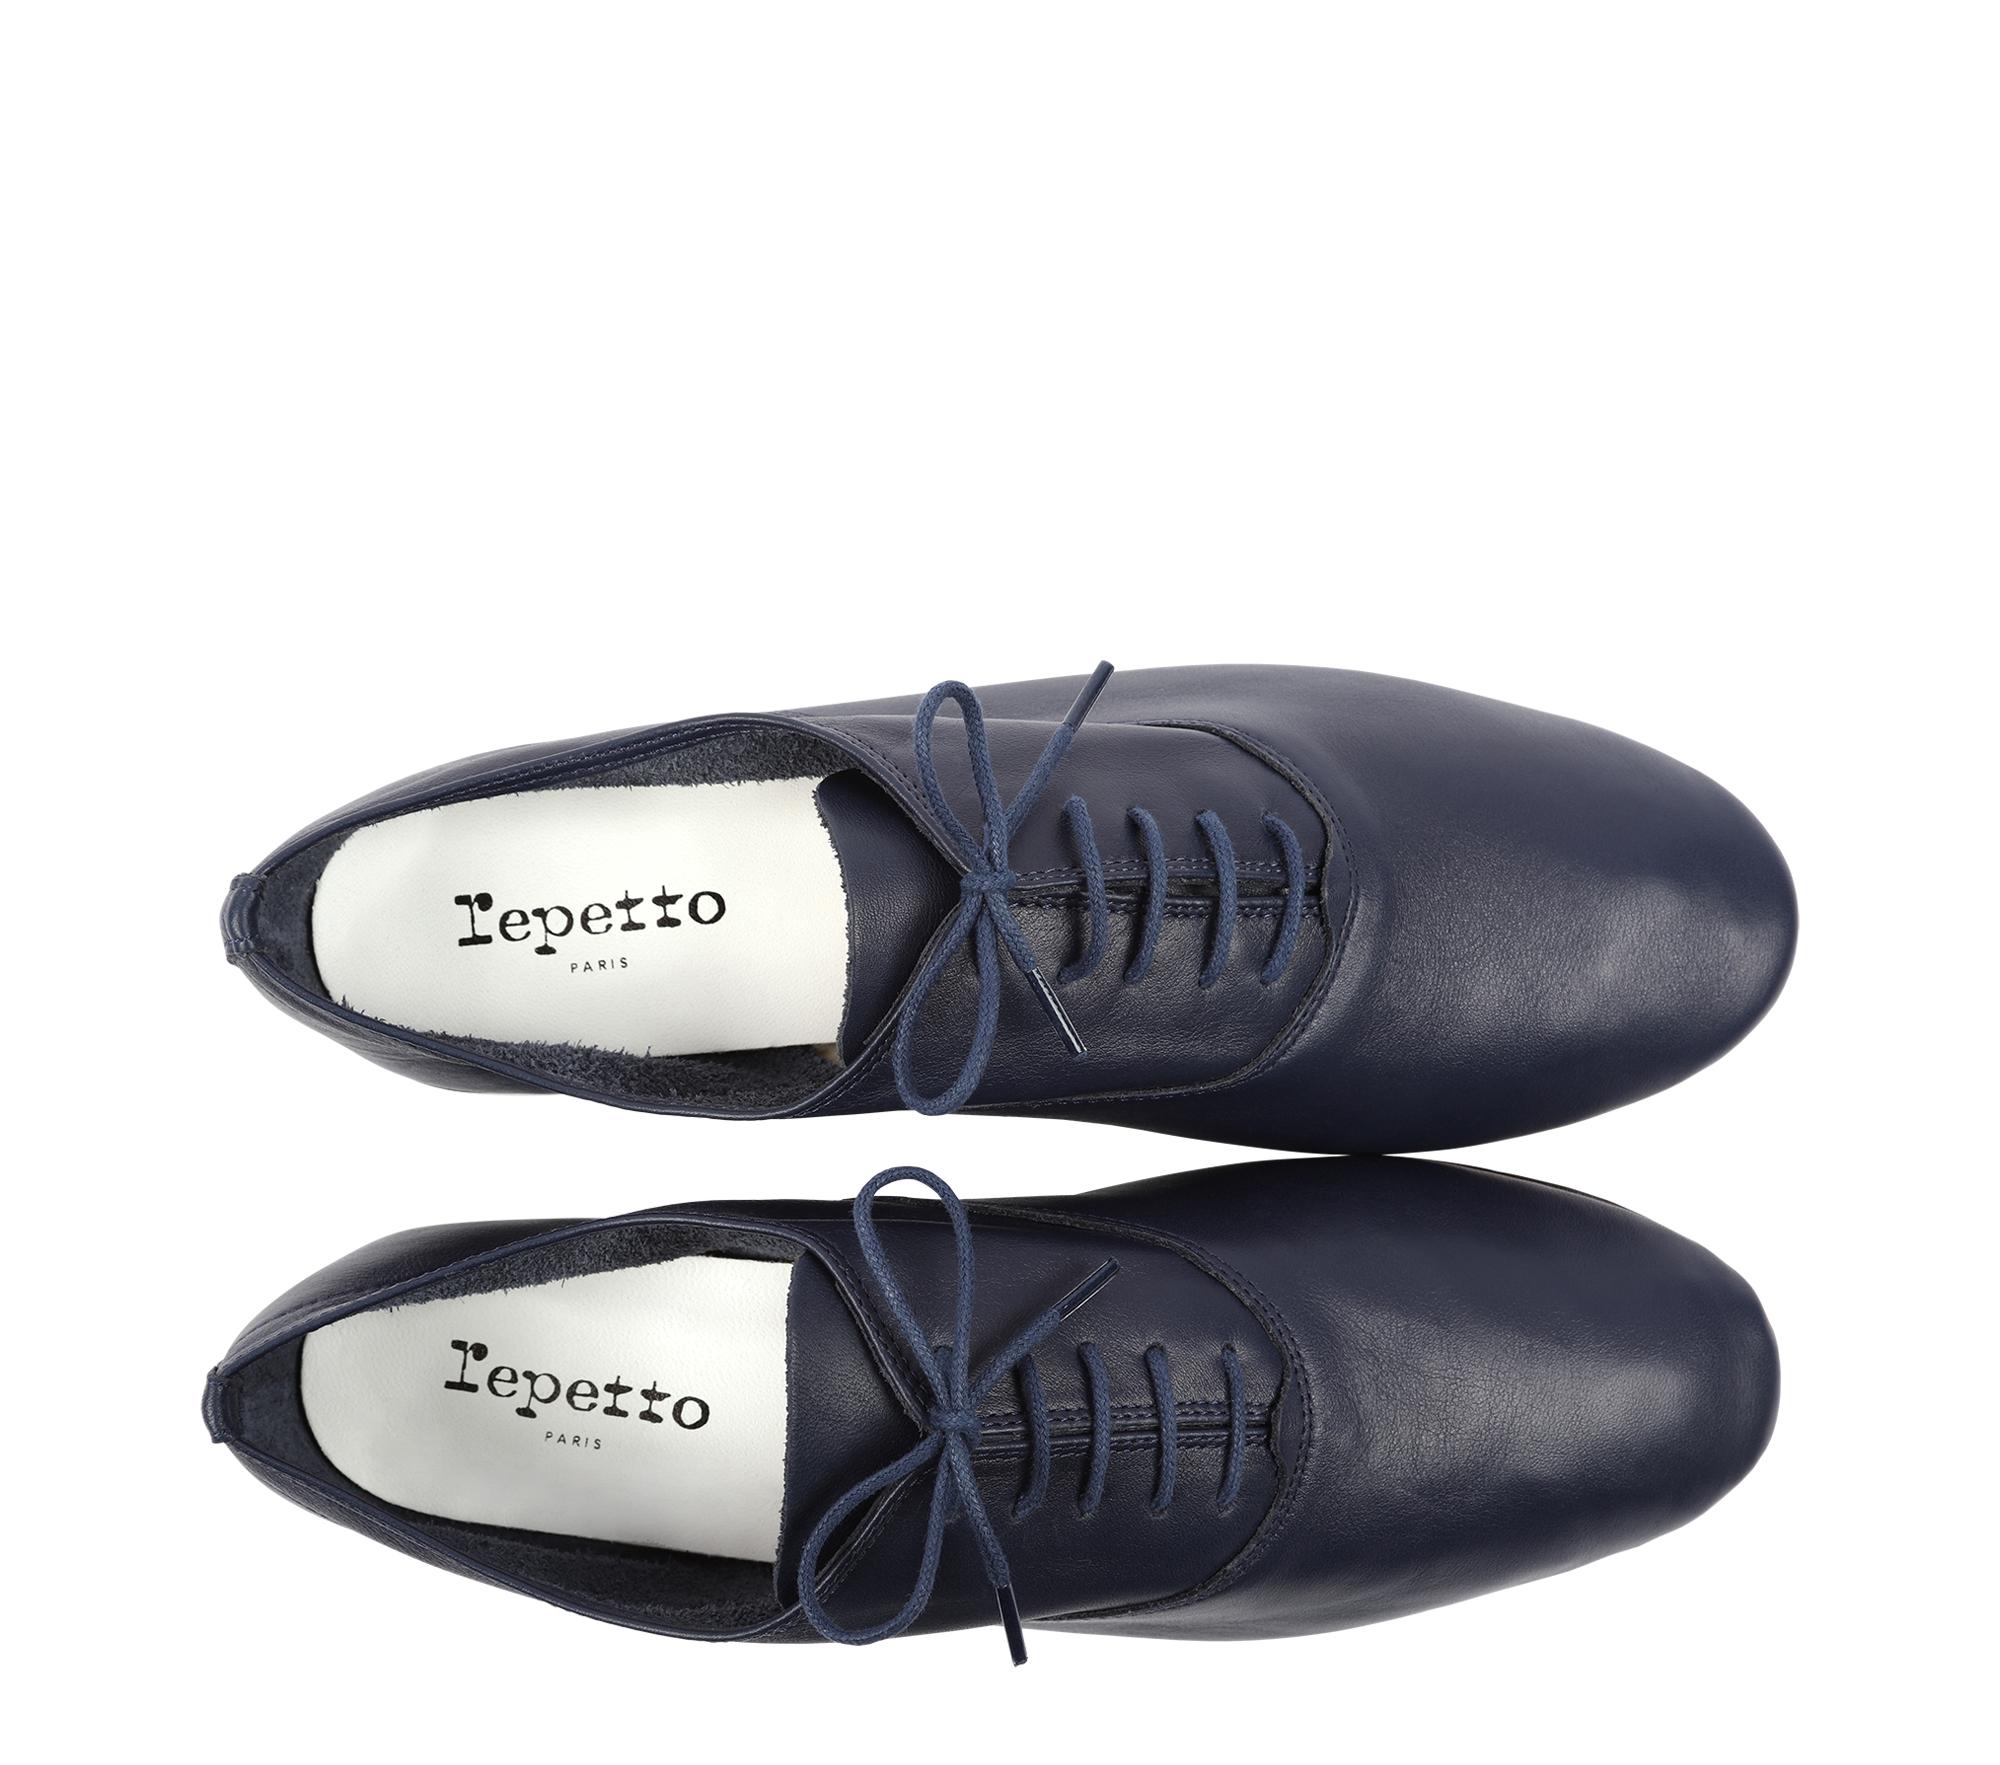 Zizi oxford shoes - Man